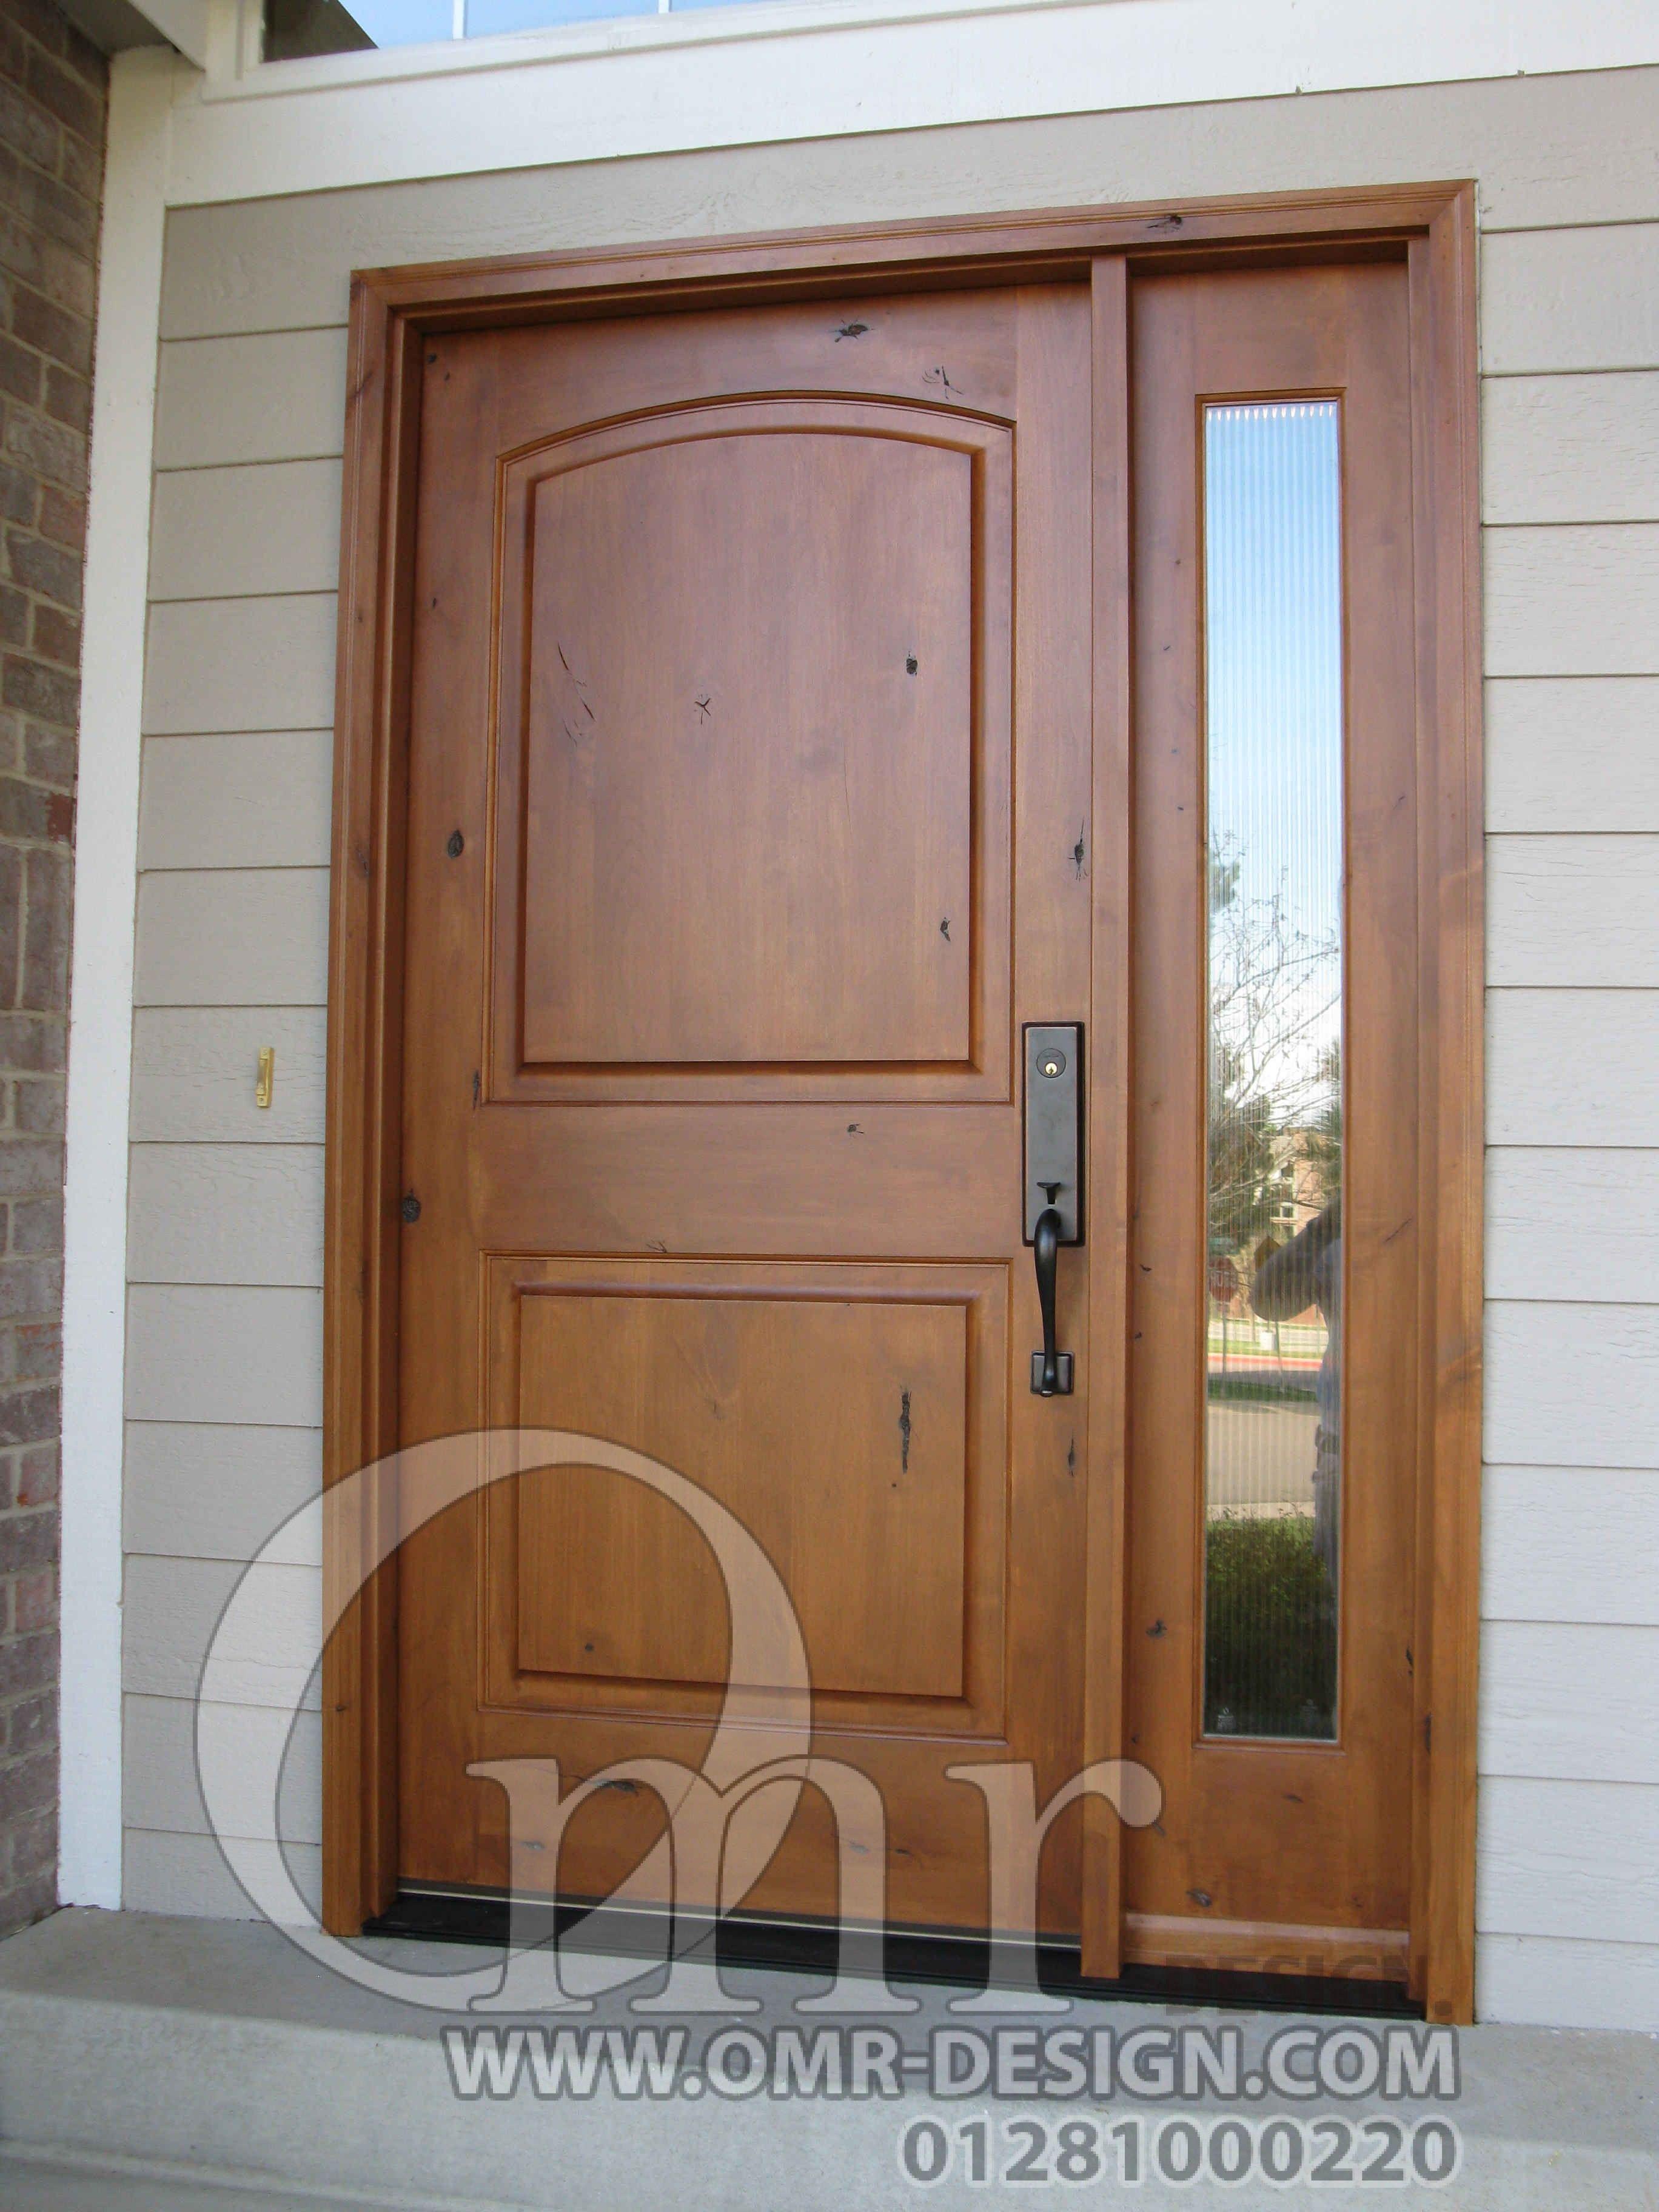 Exterior Door Frame Construction : Fresh Exterior Door Frame Construction Popular Home Design Best And Exterior Door Frame Construction Architecture